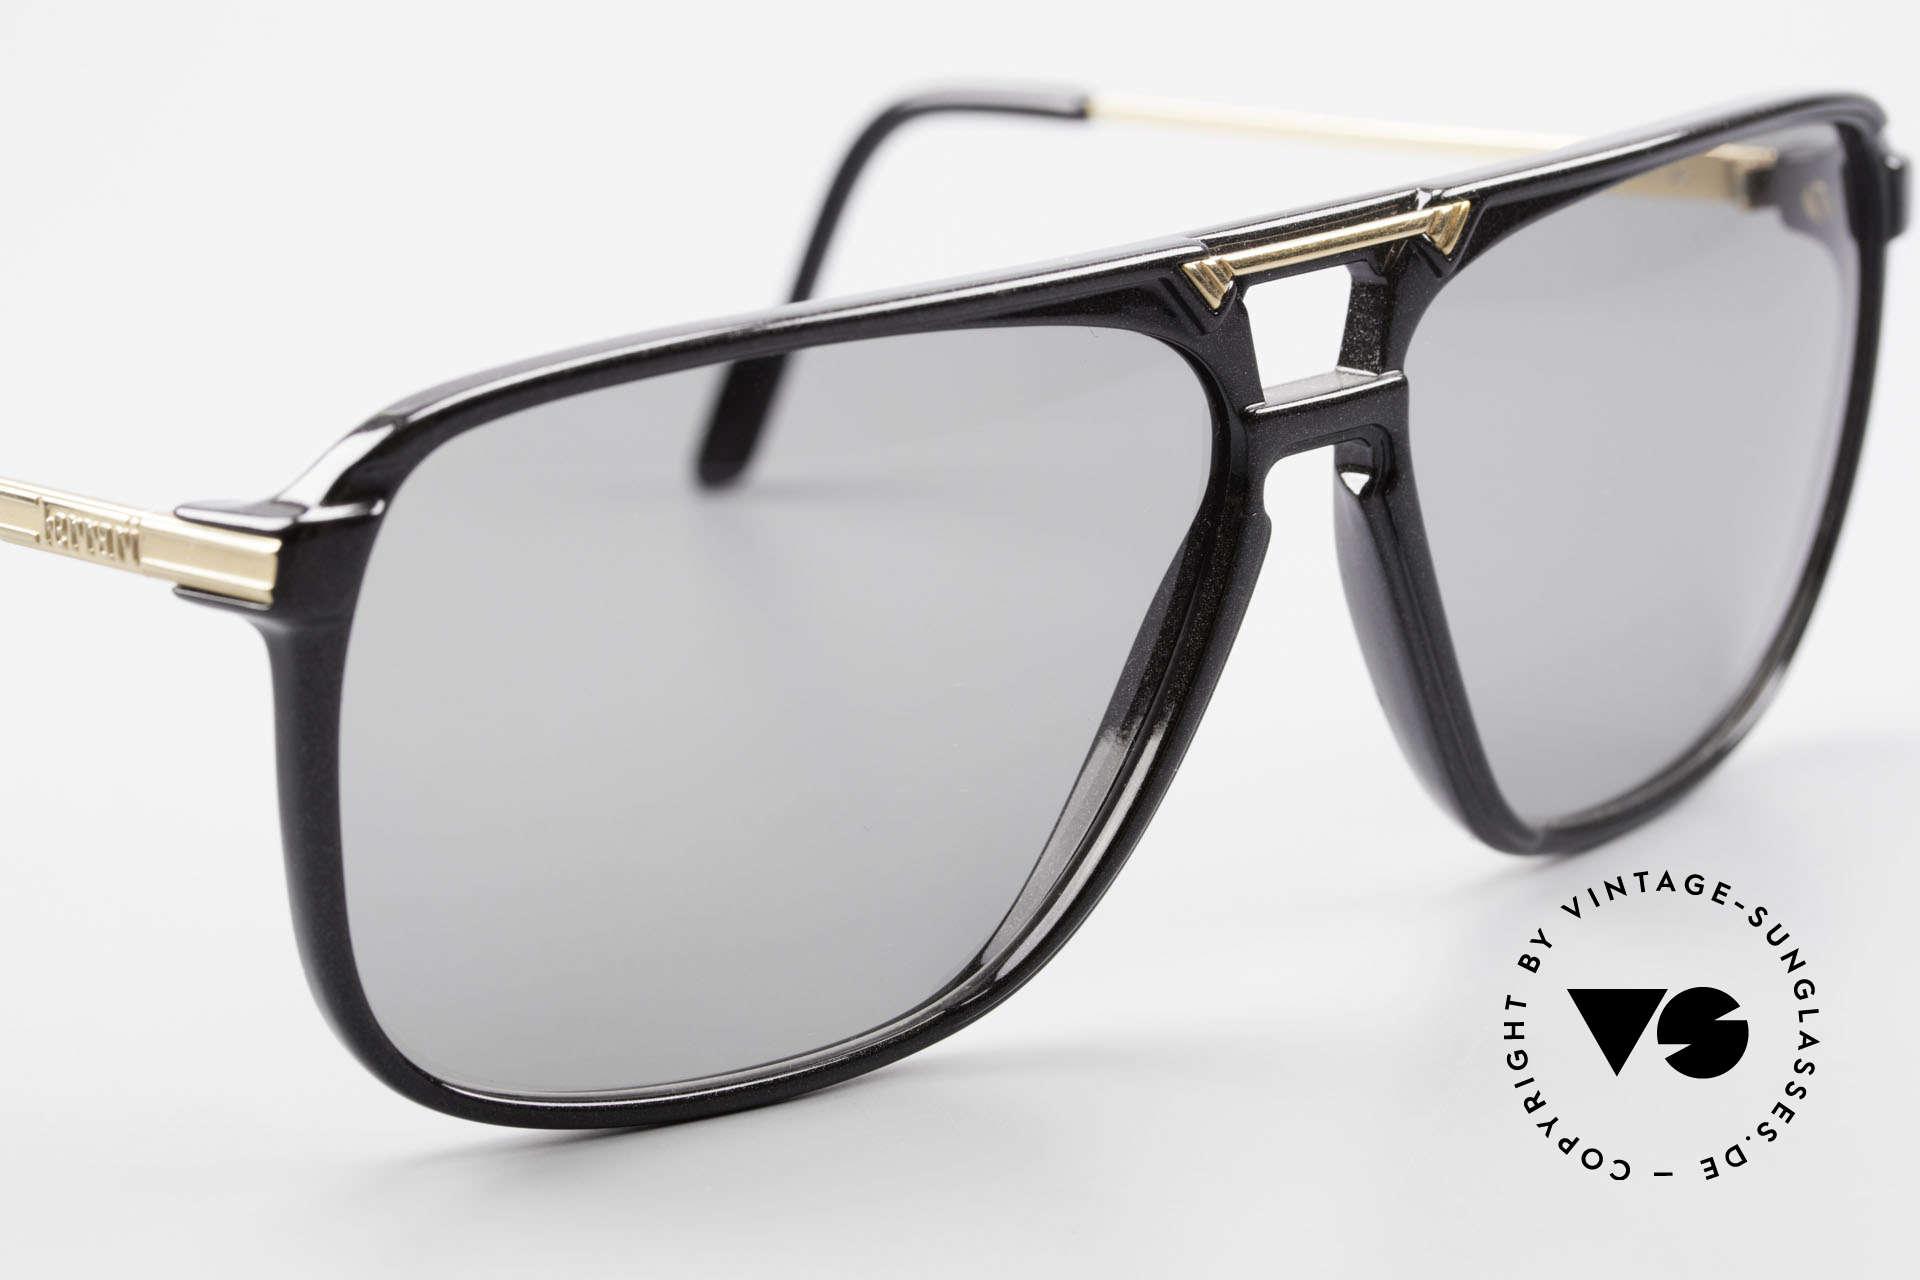 Ferrari F36/S Men's Carbon Sunglasses 90's, unworn (like all our rare Ferrari designer sunglasses), Made for Men